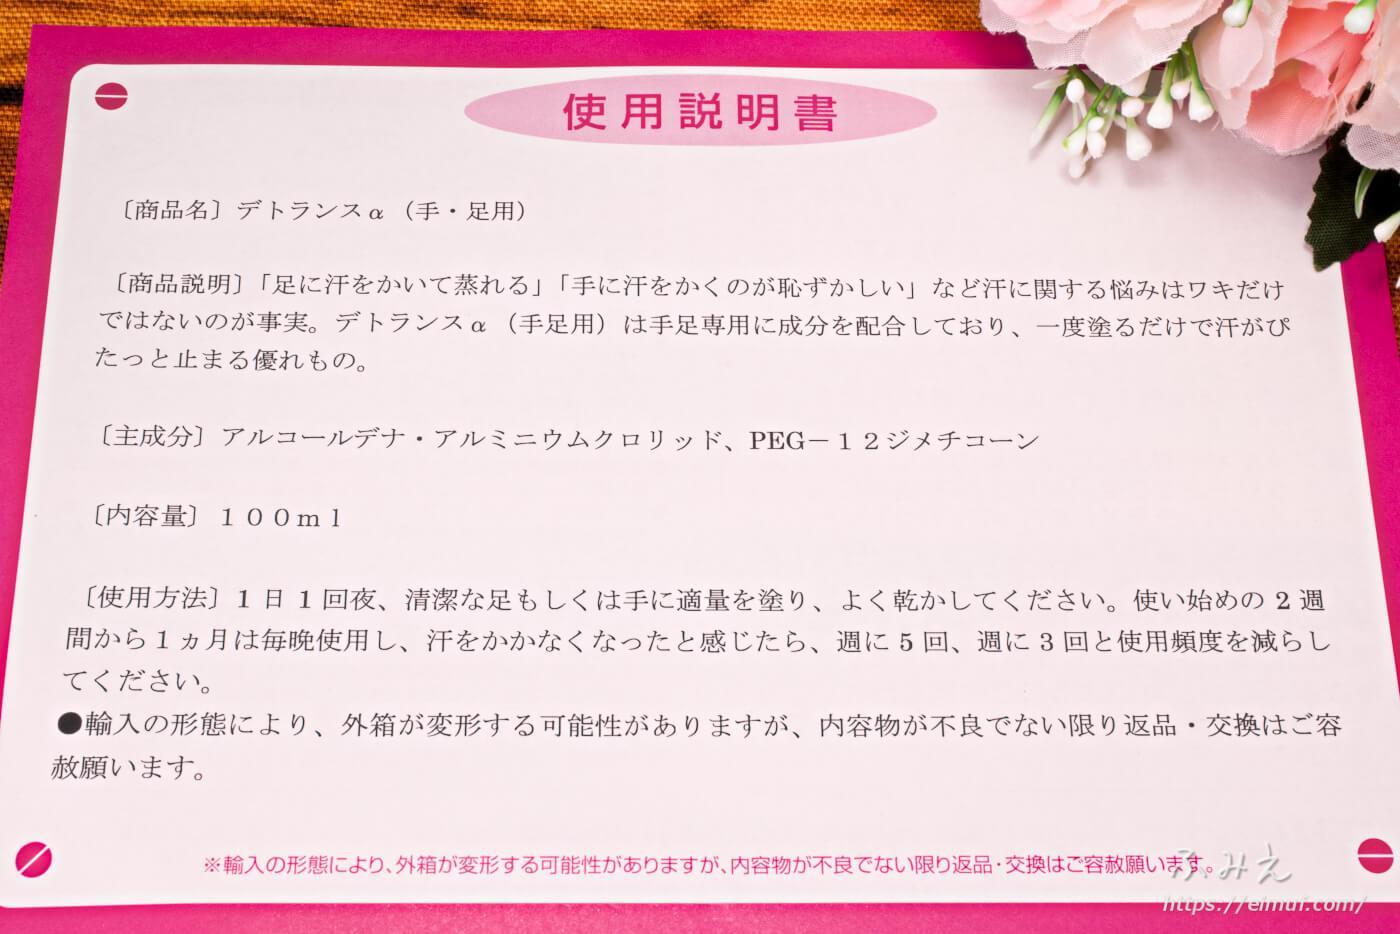 YOUUP(ユーアップ) デトランスα 手足用 の日本語の説明書